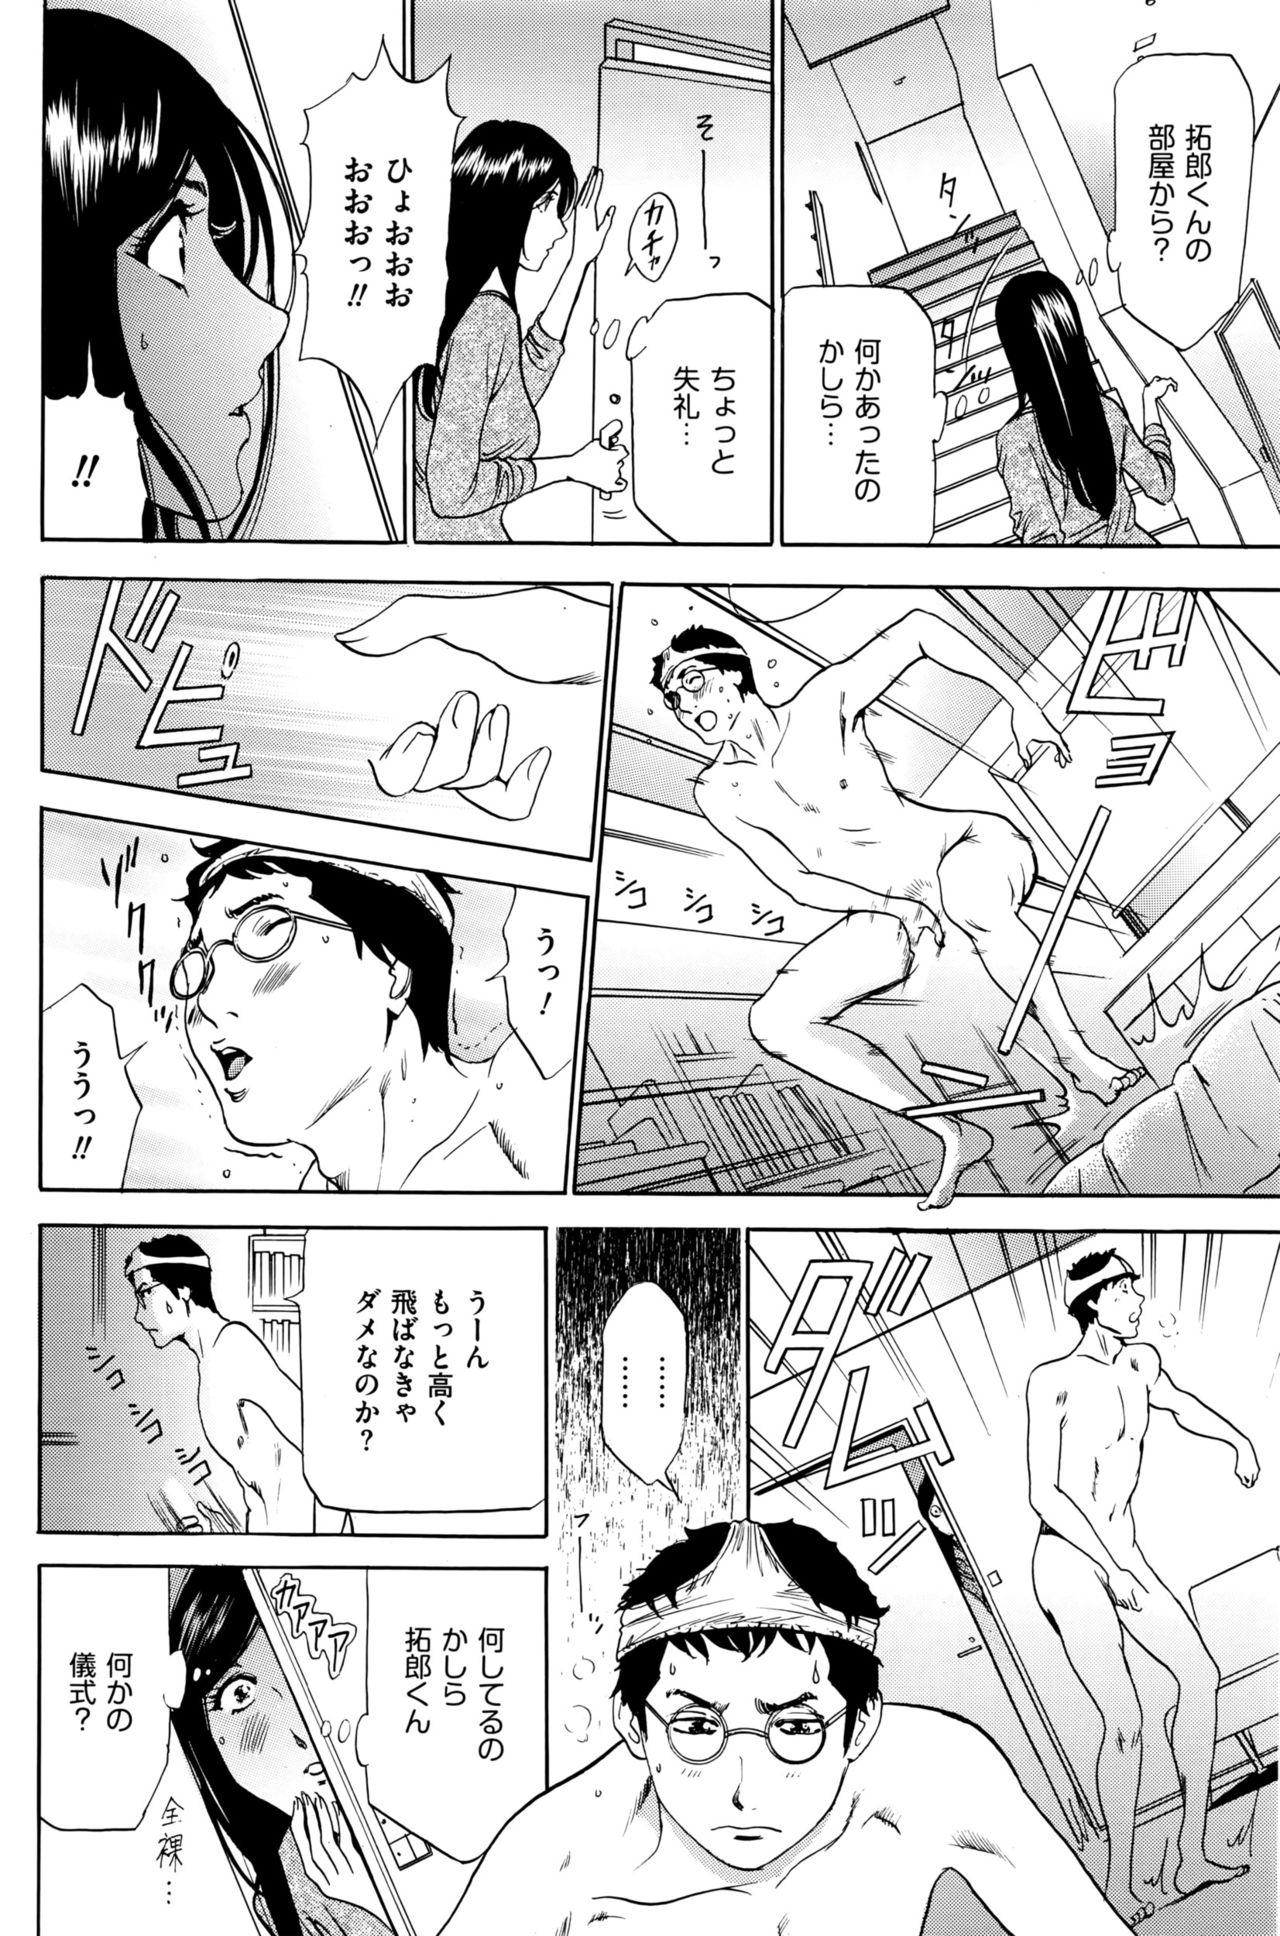 Wa Usuki Ipa a 1-10 22